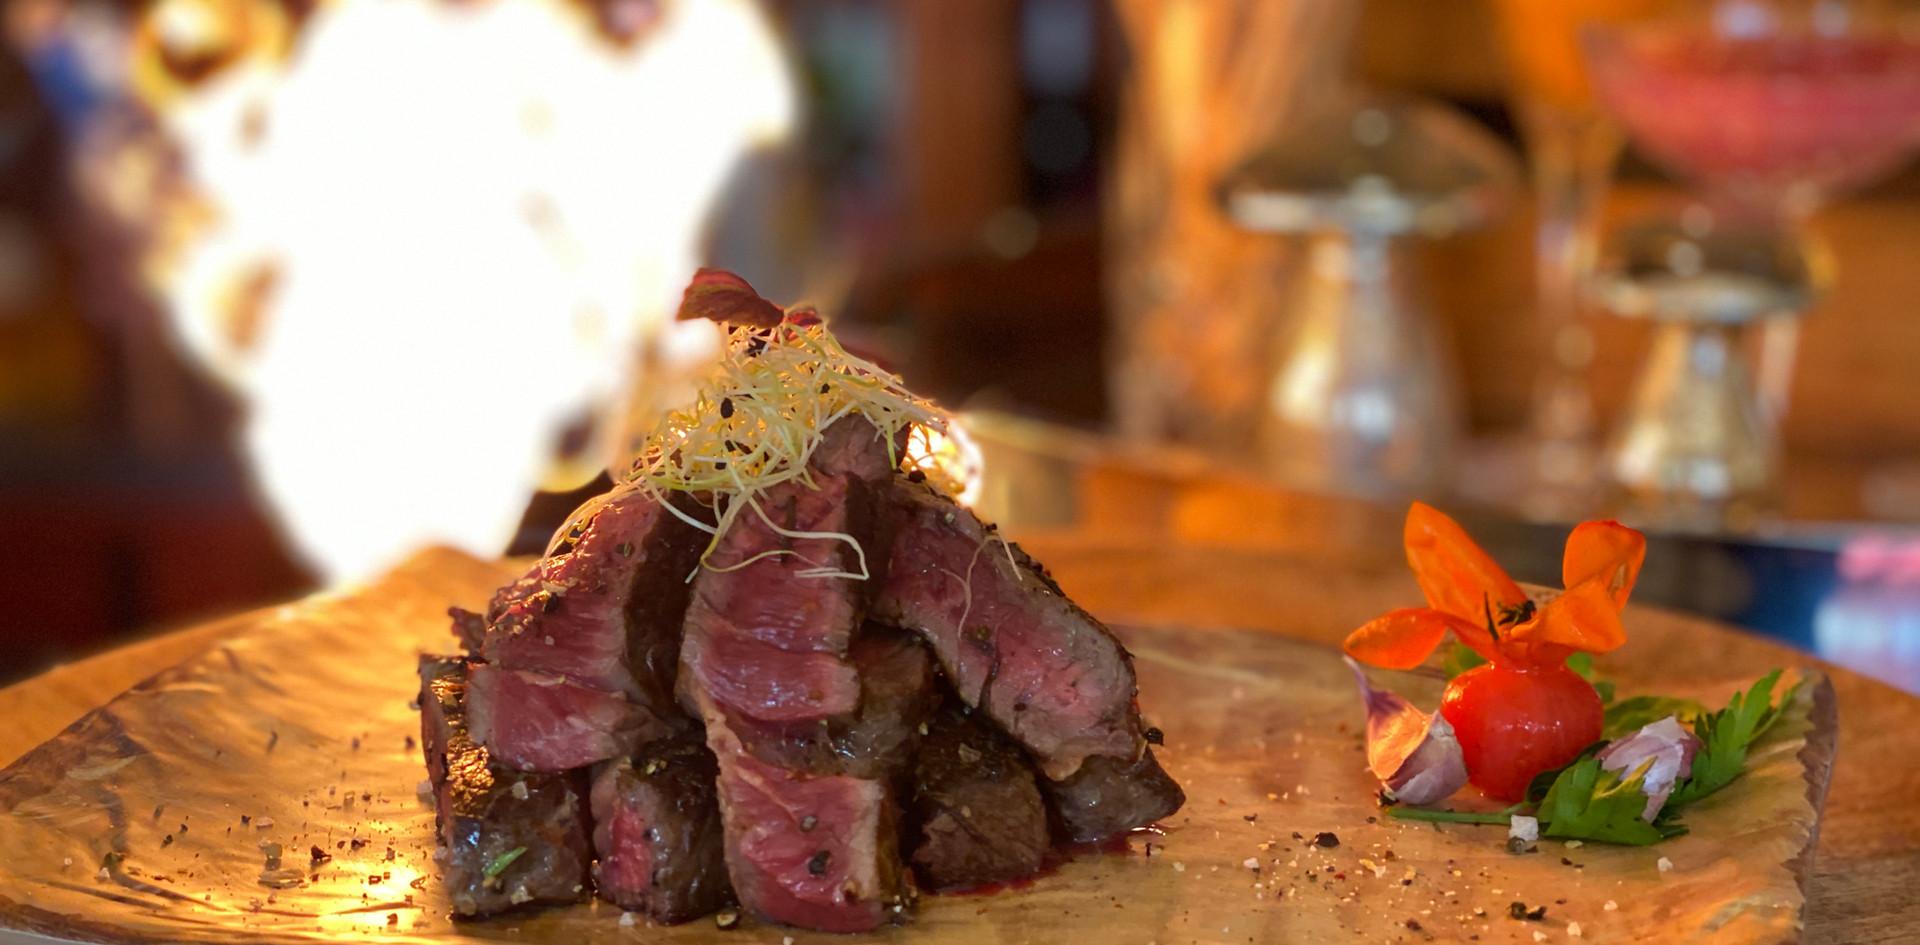 Rumpsteak Restaurant Dinner - Hotel Wegner - The culinary Art Hotel